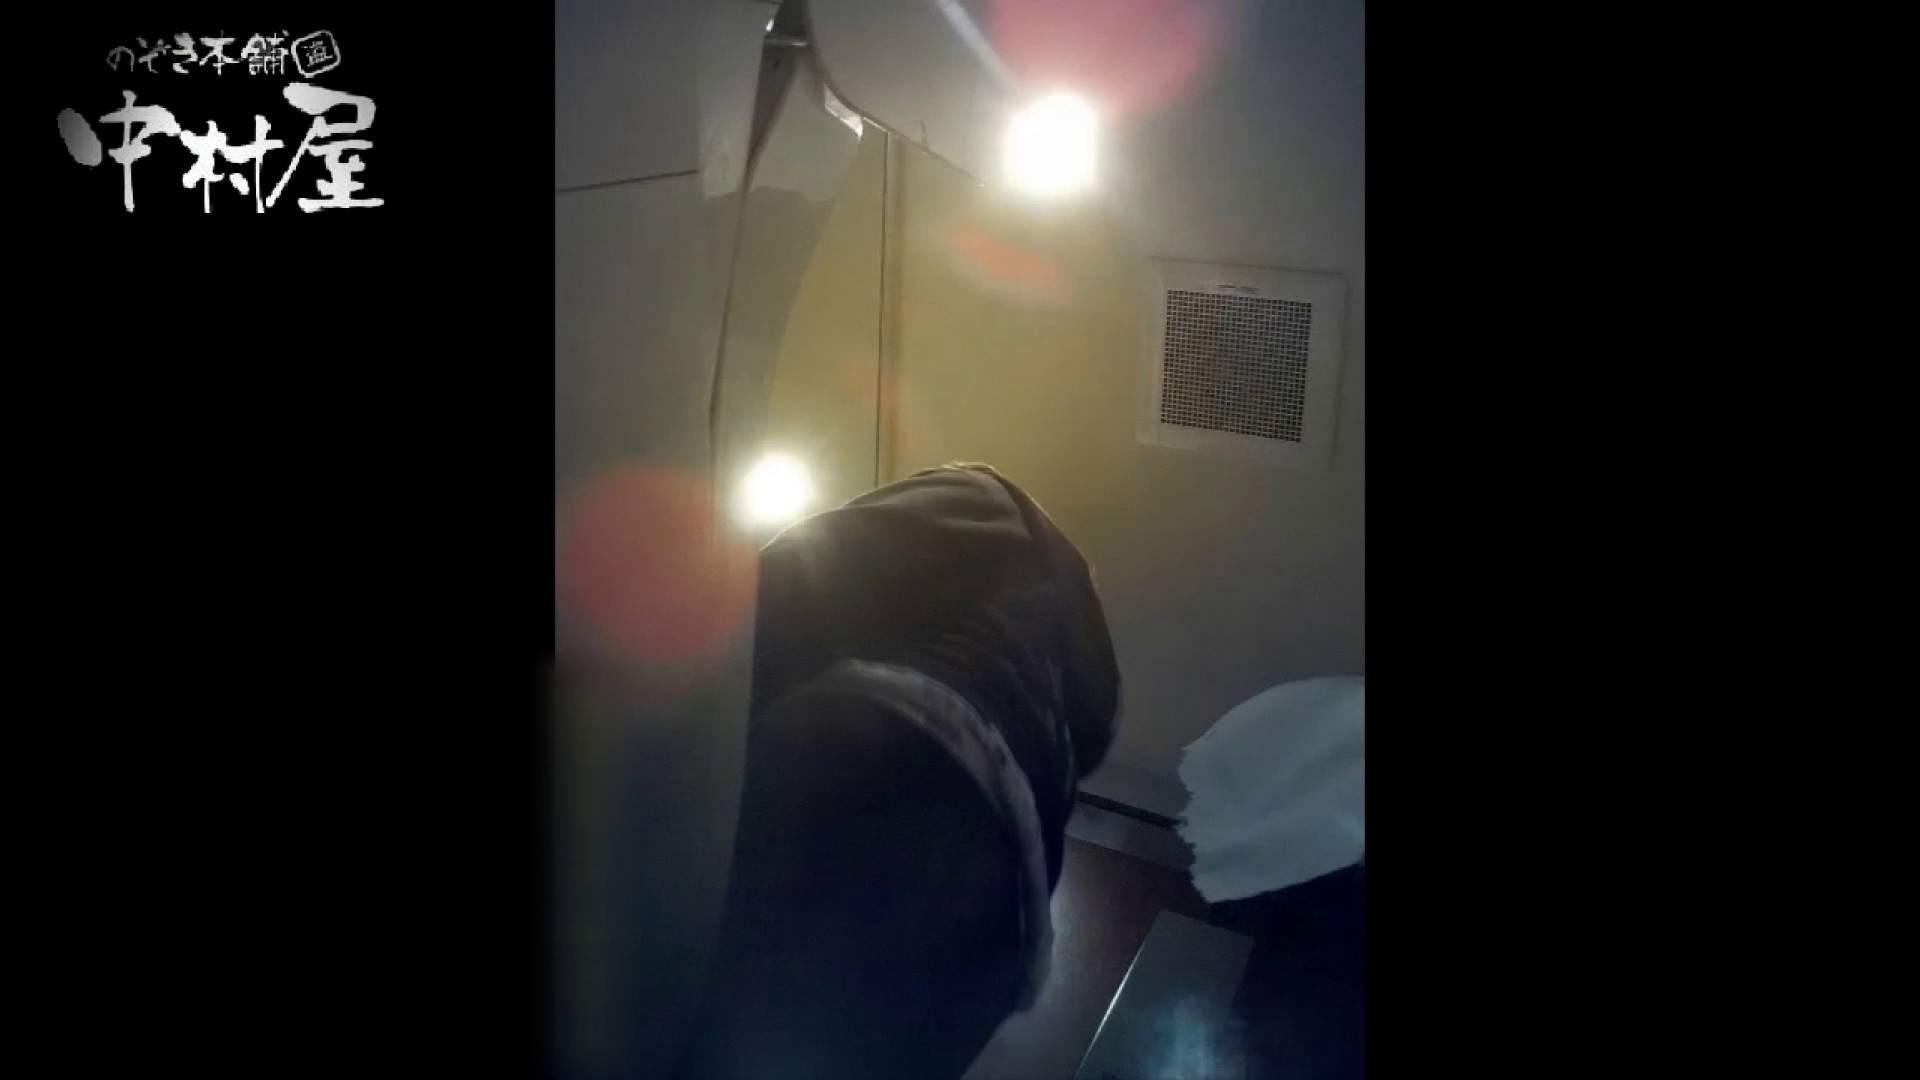 高画質トイレ盗撮vol.09 高画質 | OL女体  61連発 26